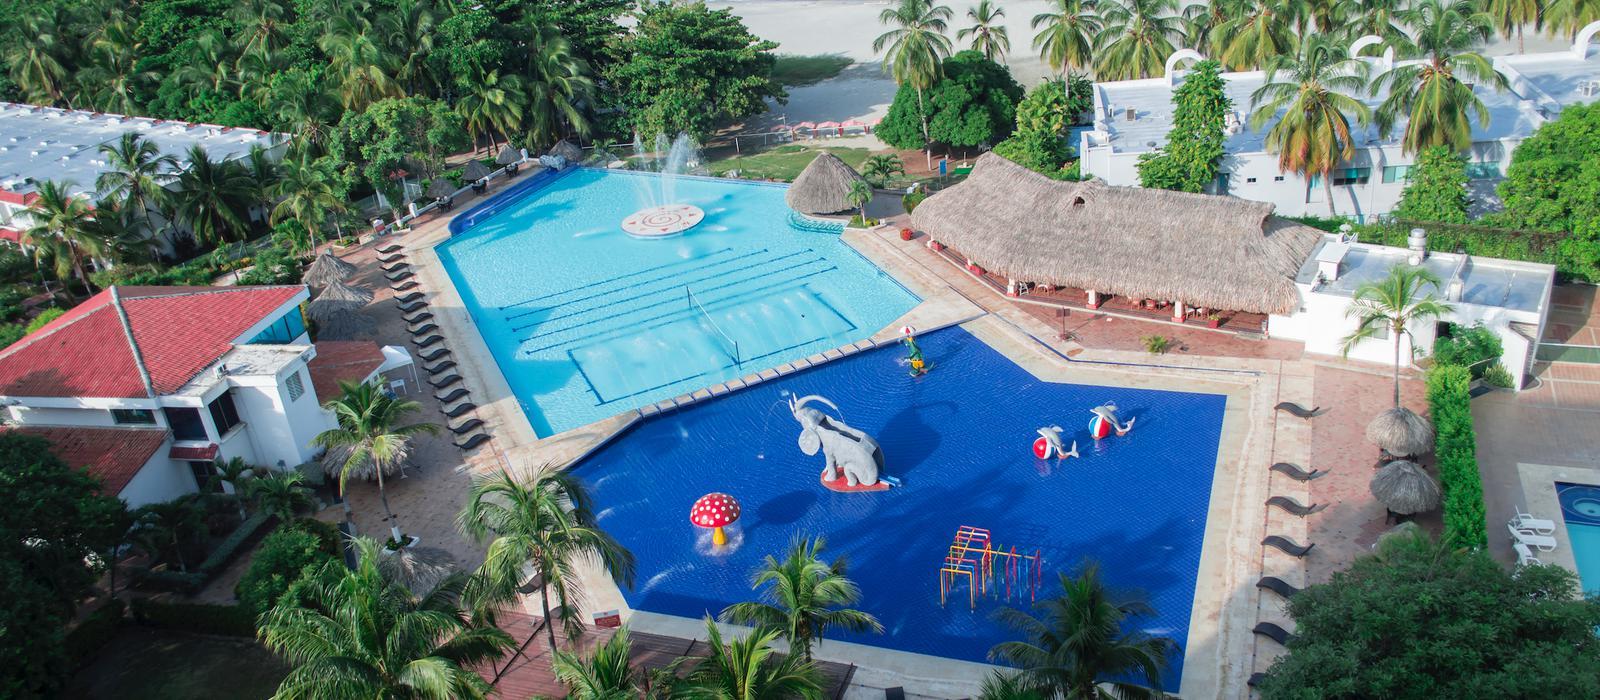 Ghl Relax Costa Azul Hotel Santa Marta Colombia